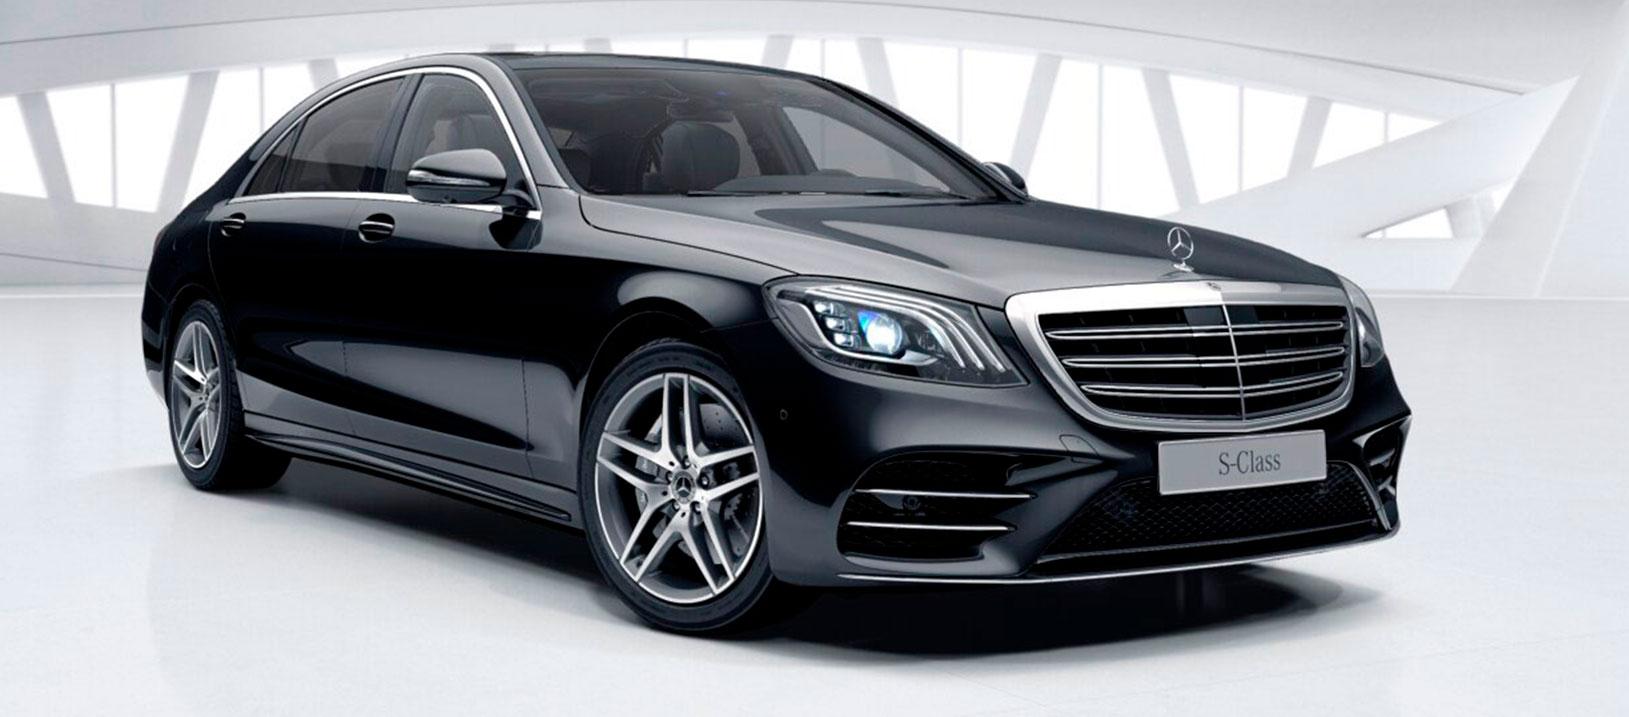 Mercedes-Benz S 400 d 4MATIC long 52600177